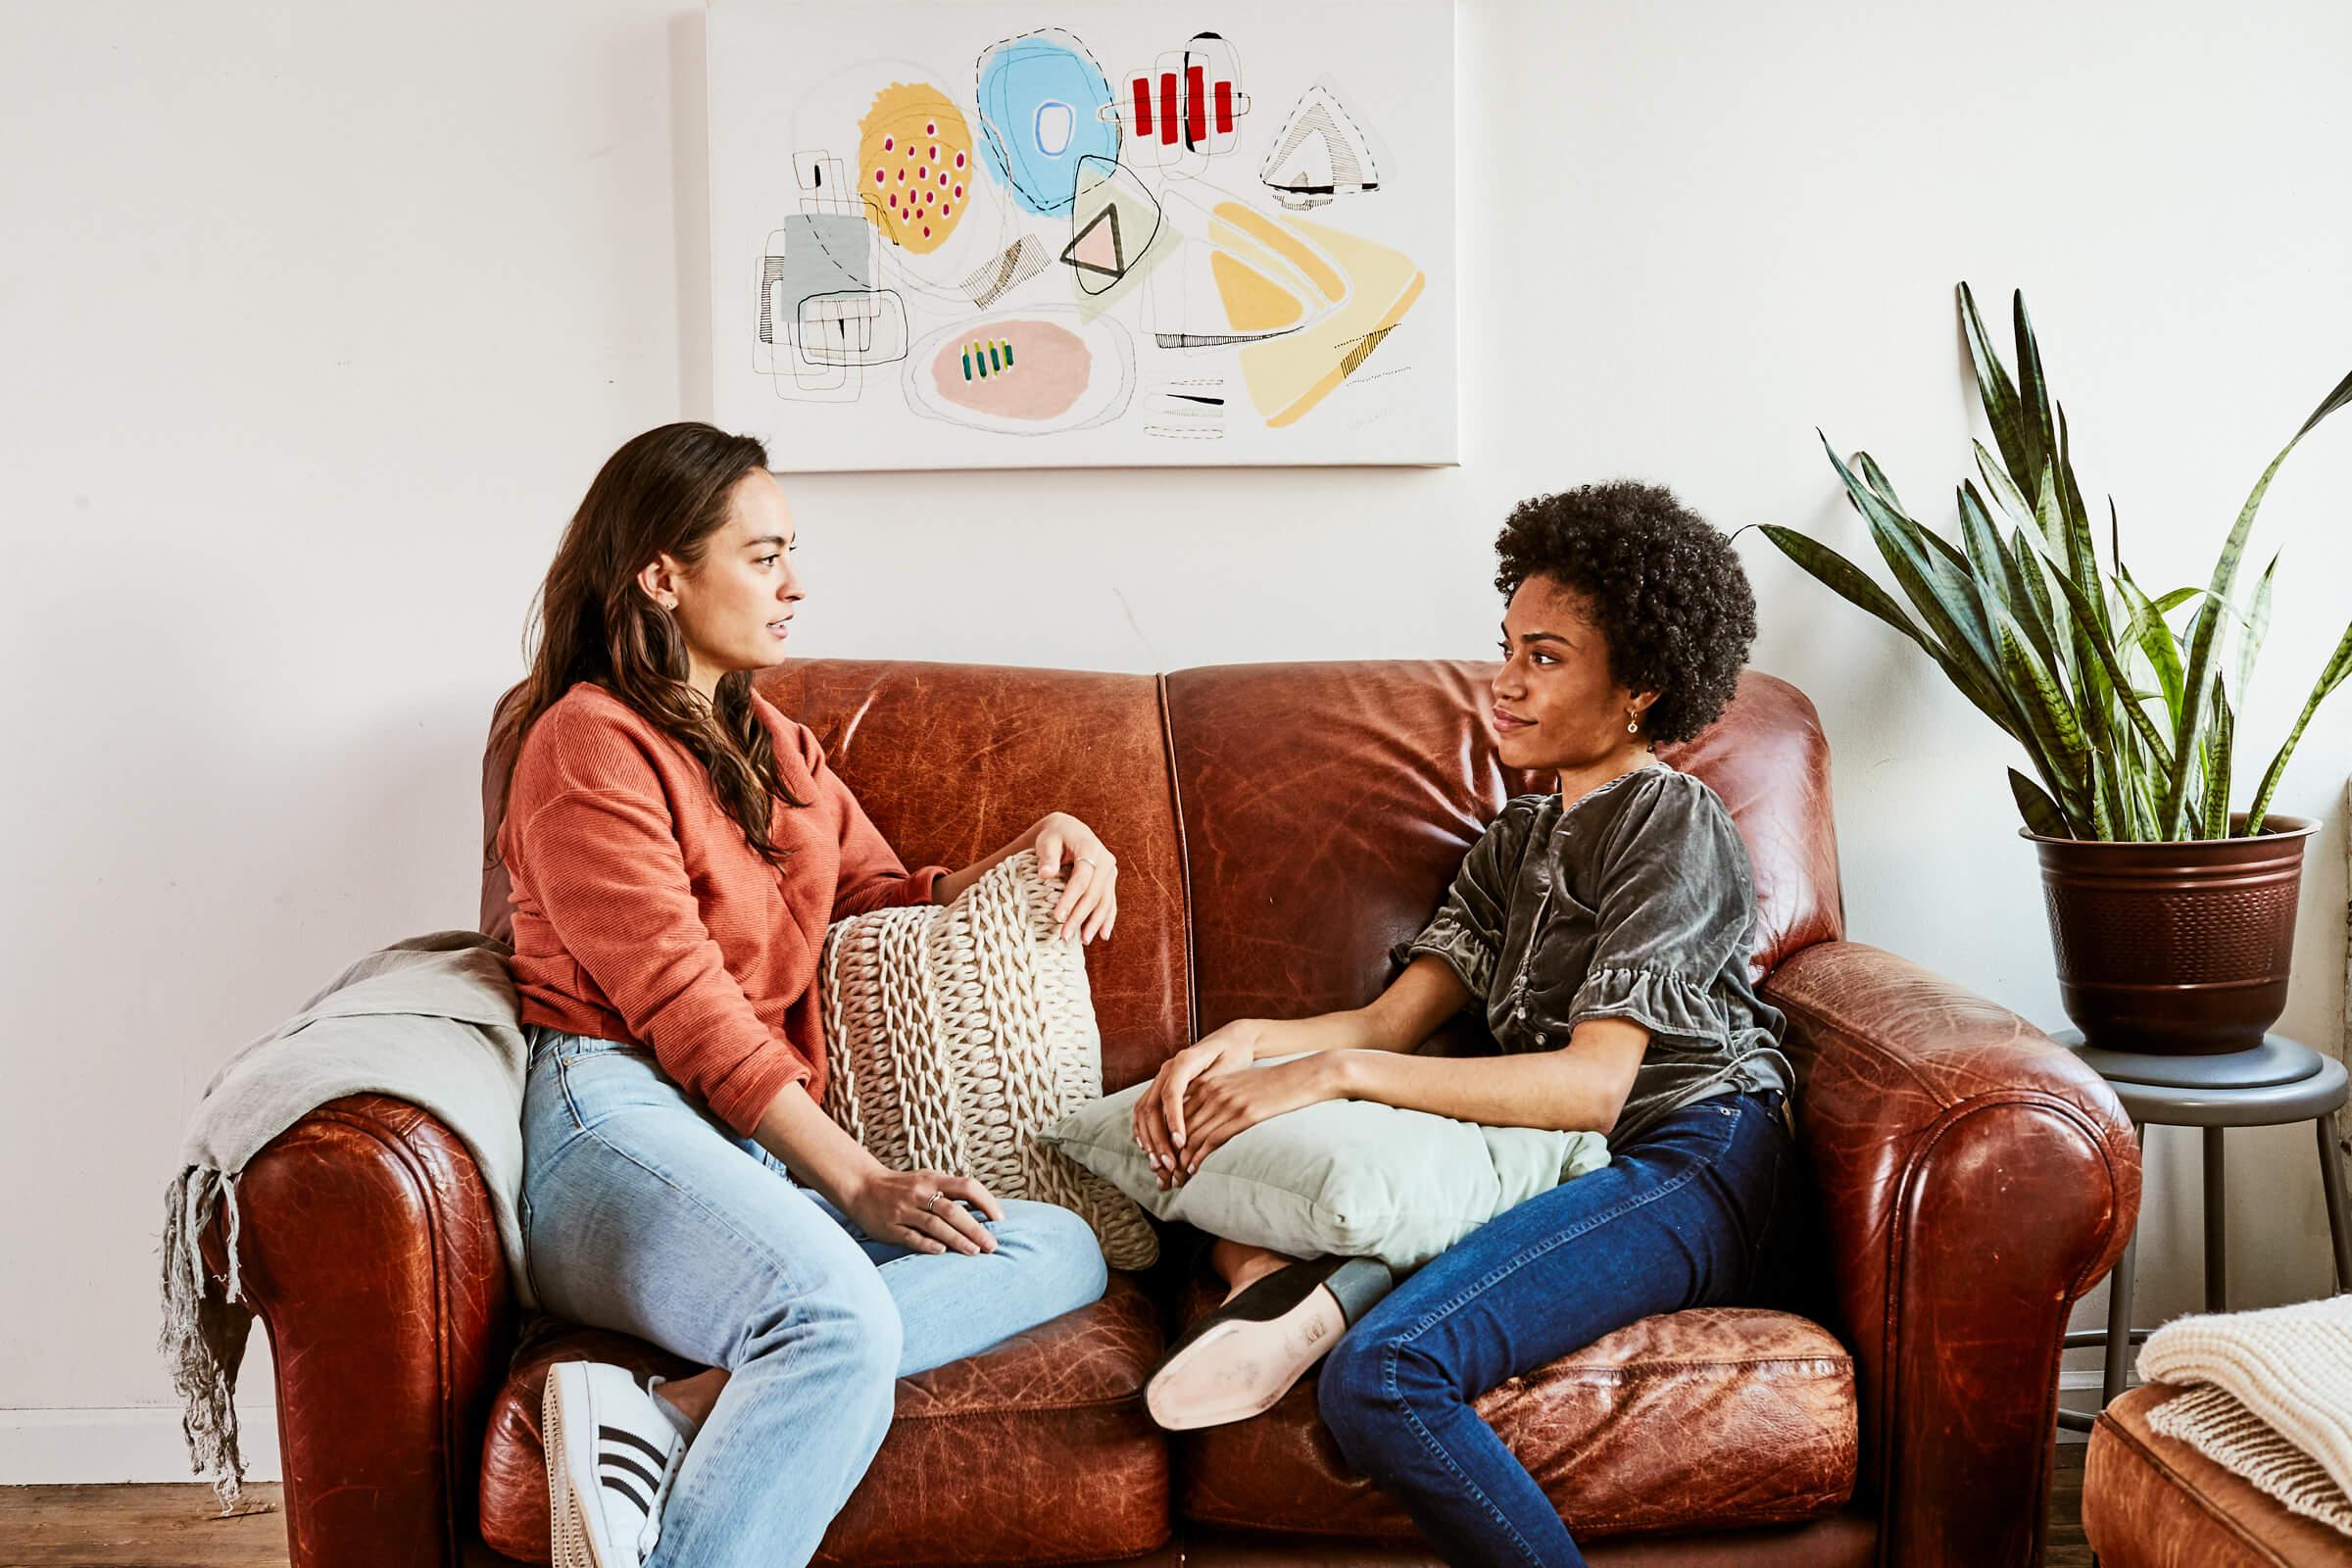 Two women talking on the sofa